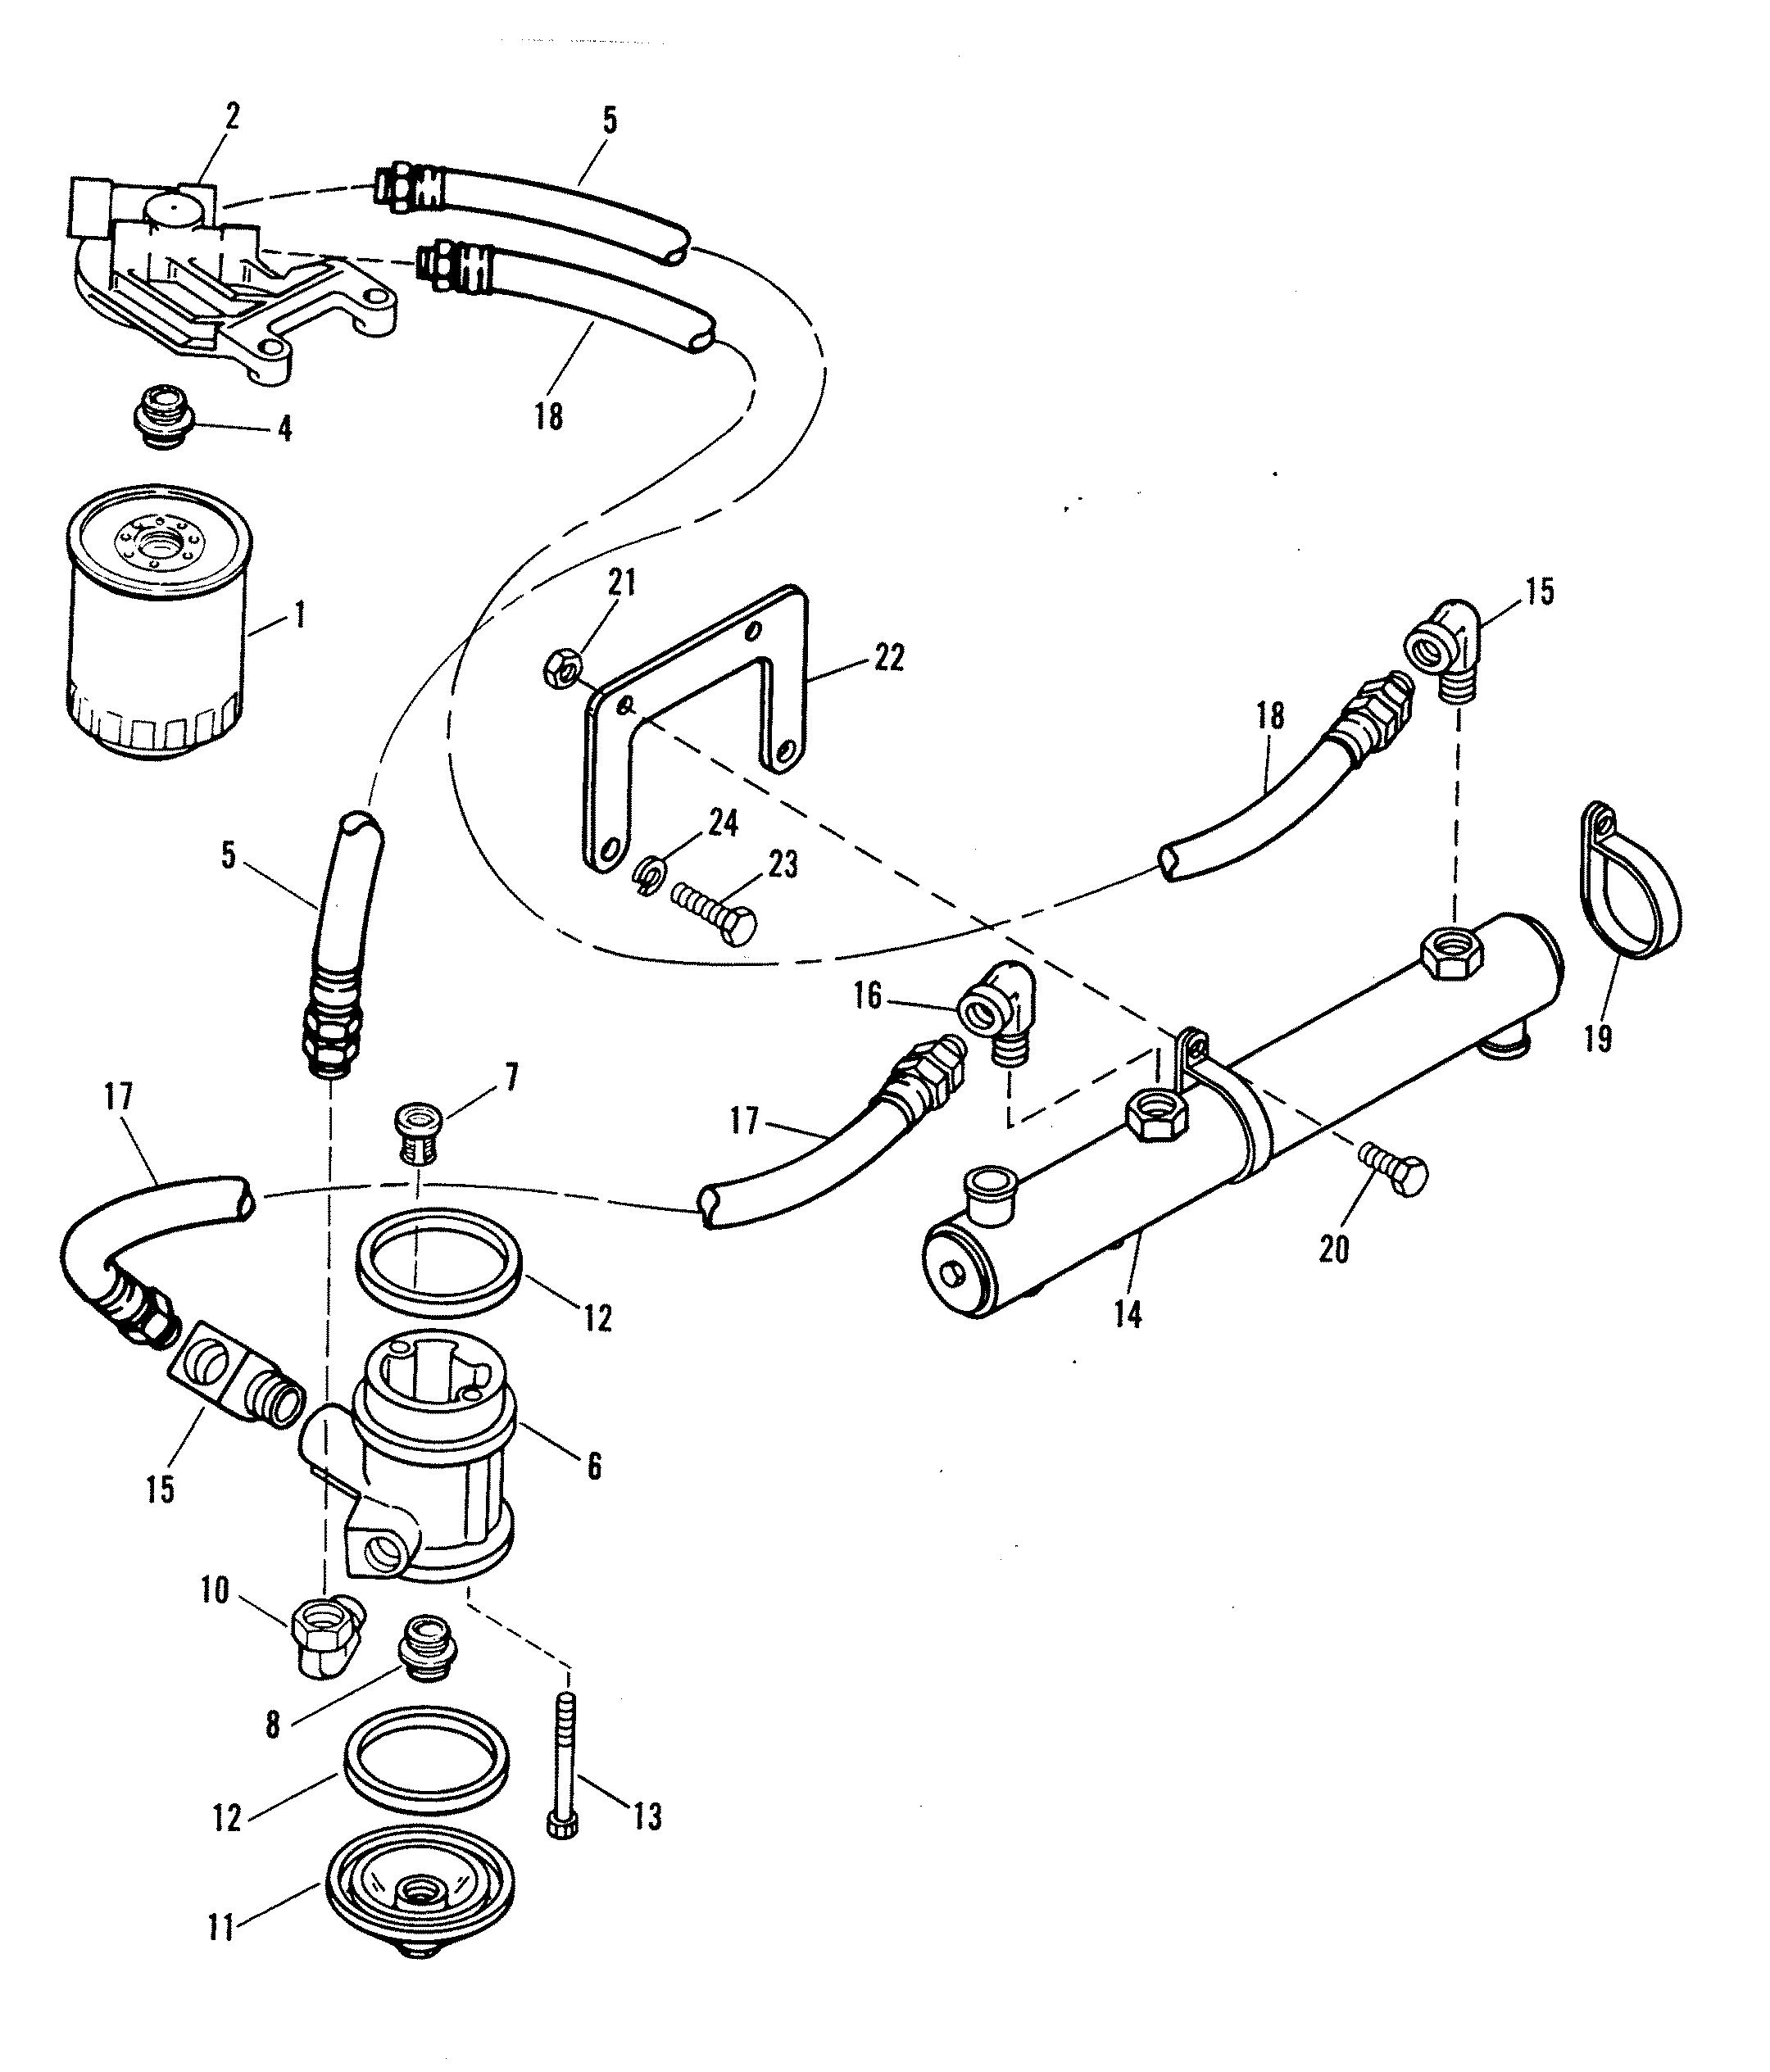 oil filter and adaptor for mercruiser 502 magnum bravo engine